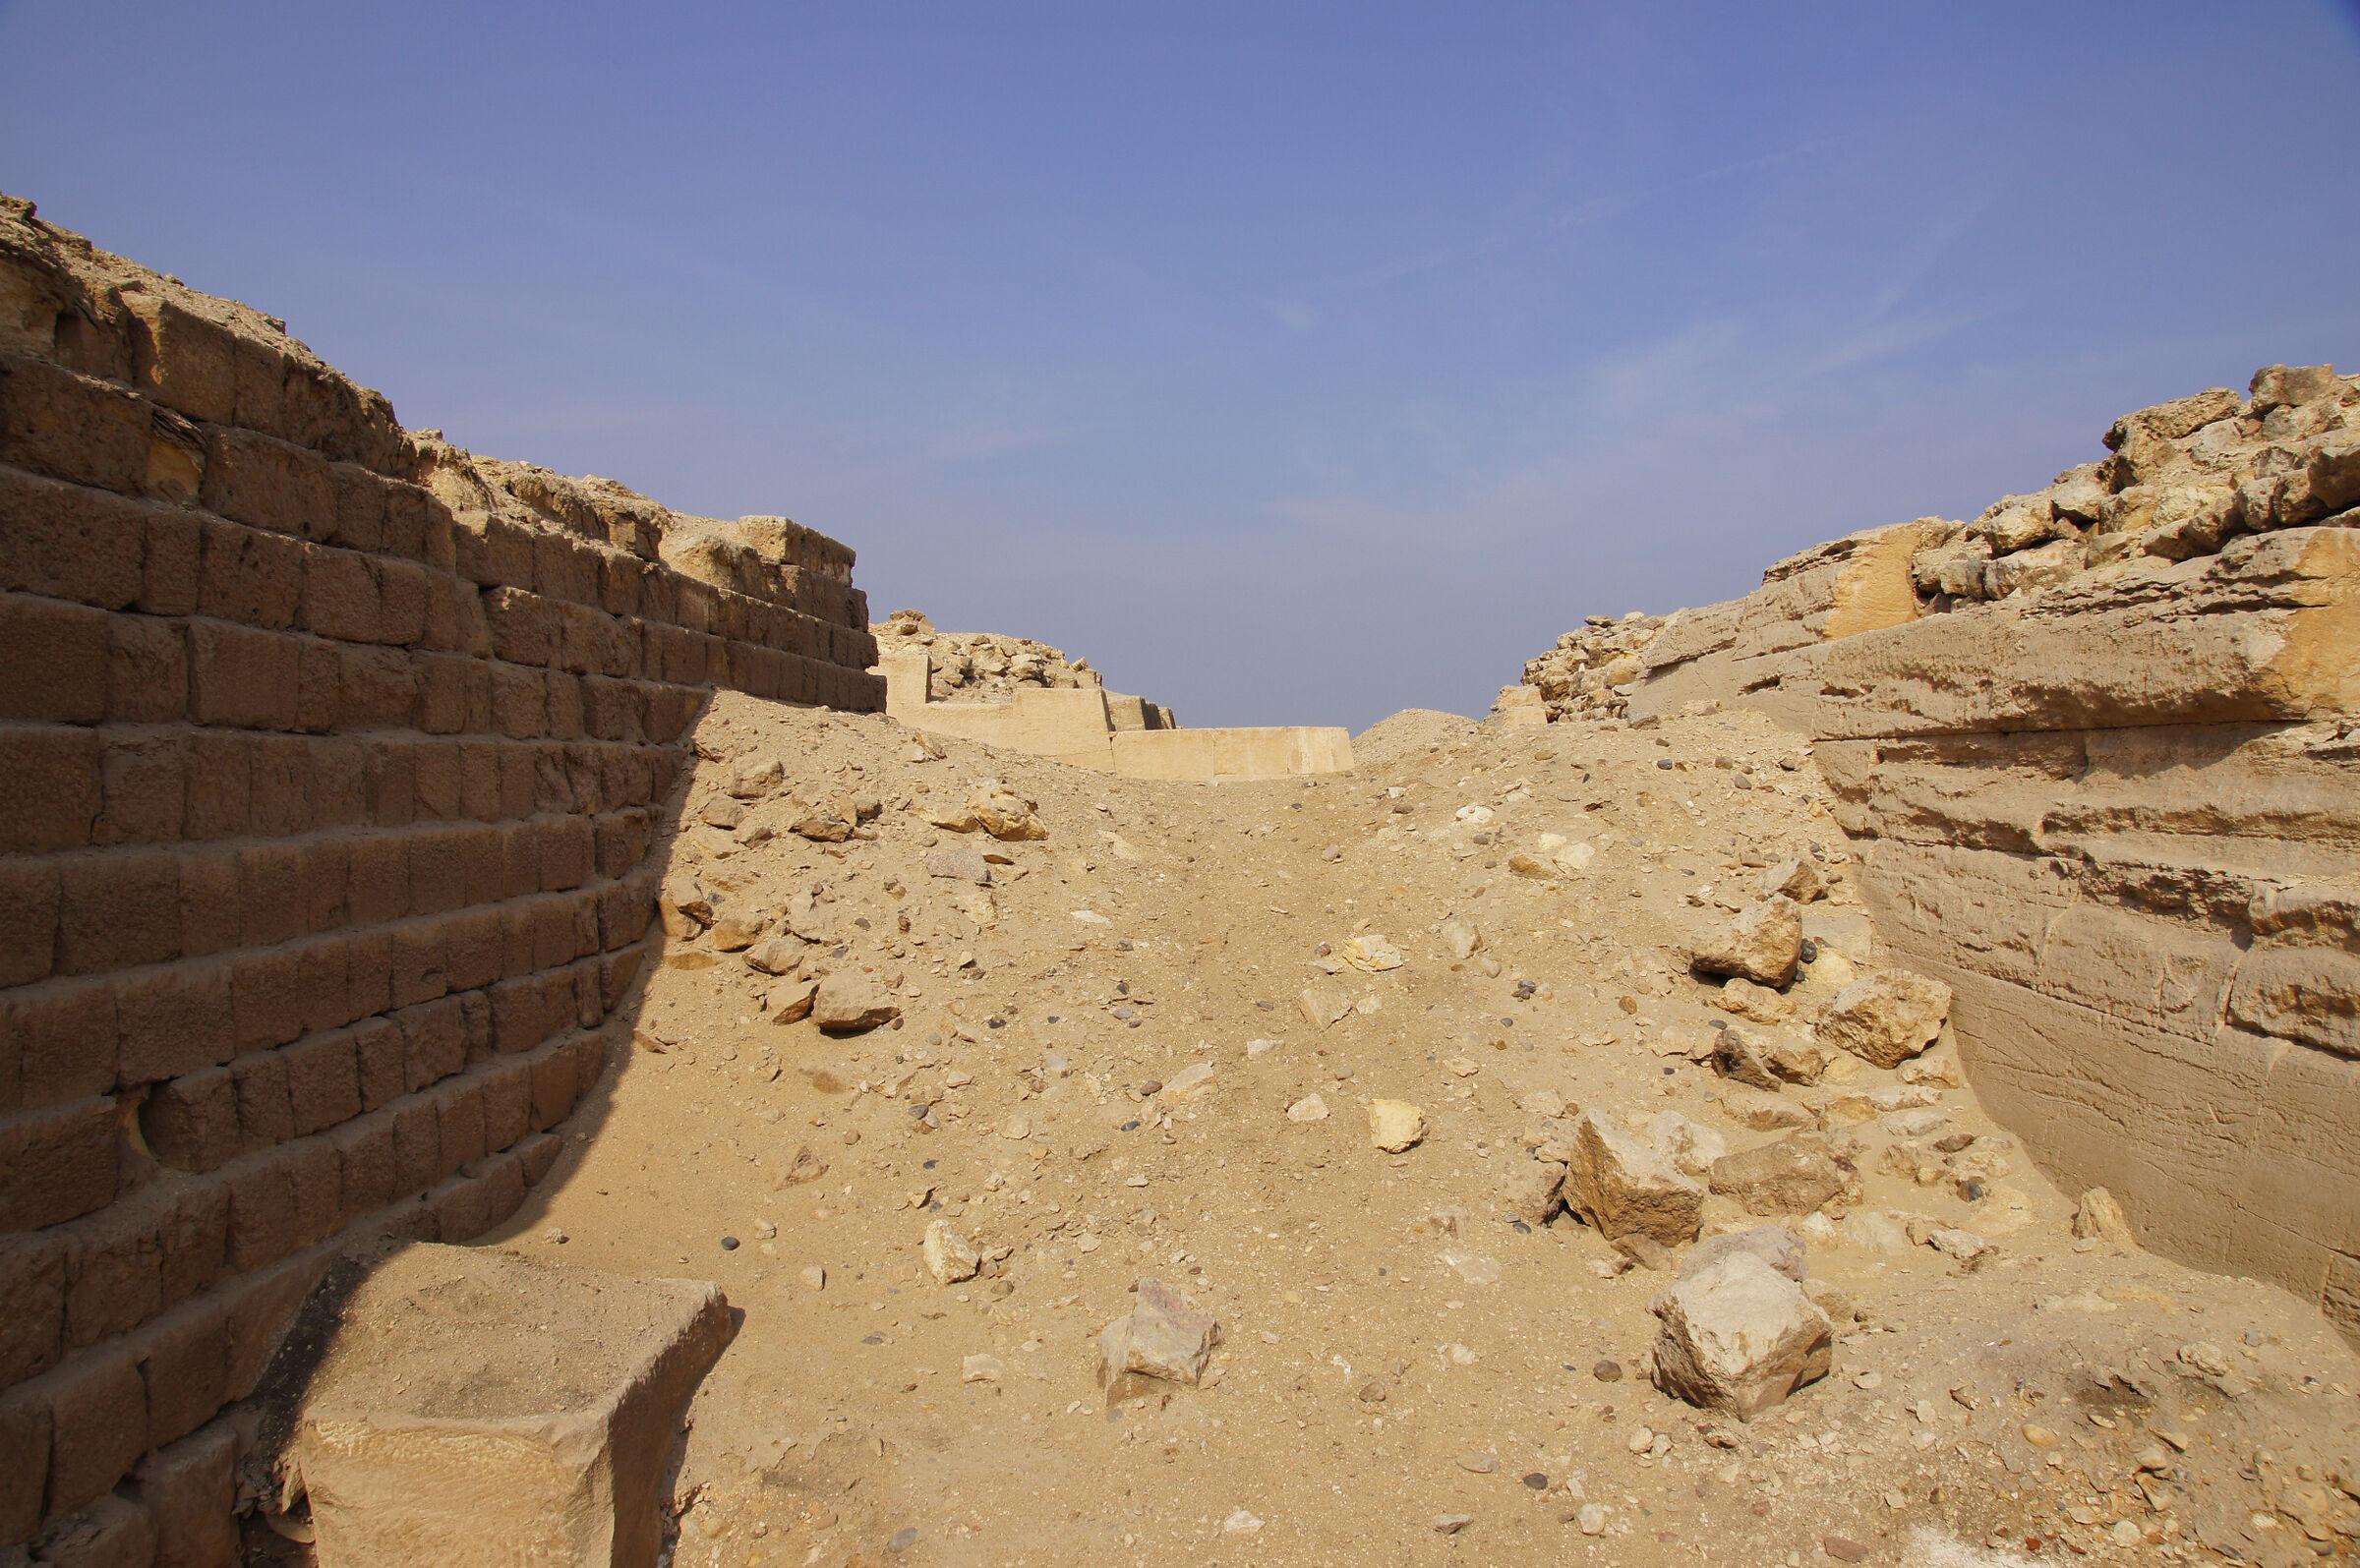 Western Cemetery: Site: Giza; View: G 2100, G 2130, G 2112, G 2114, G 2110